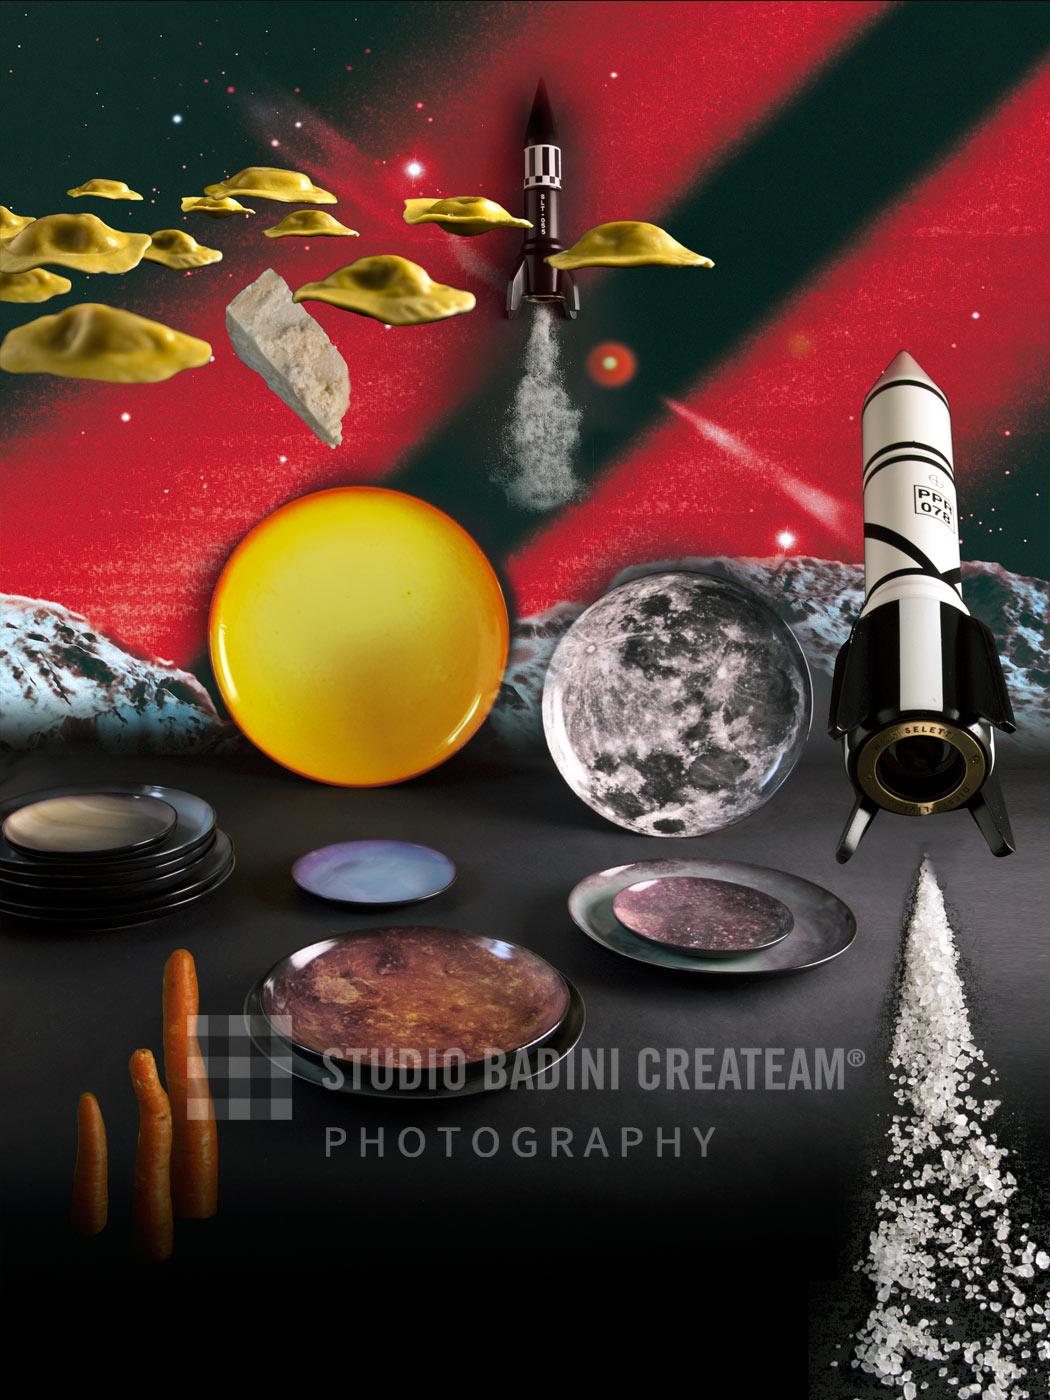 Badini Creative Studio - fotografia - diesel - cosmic